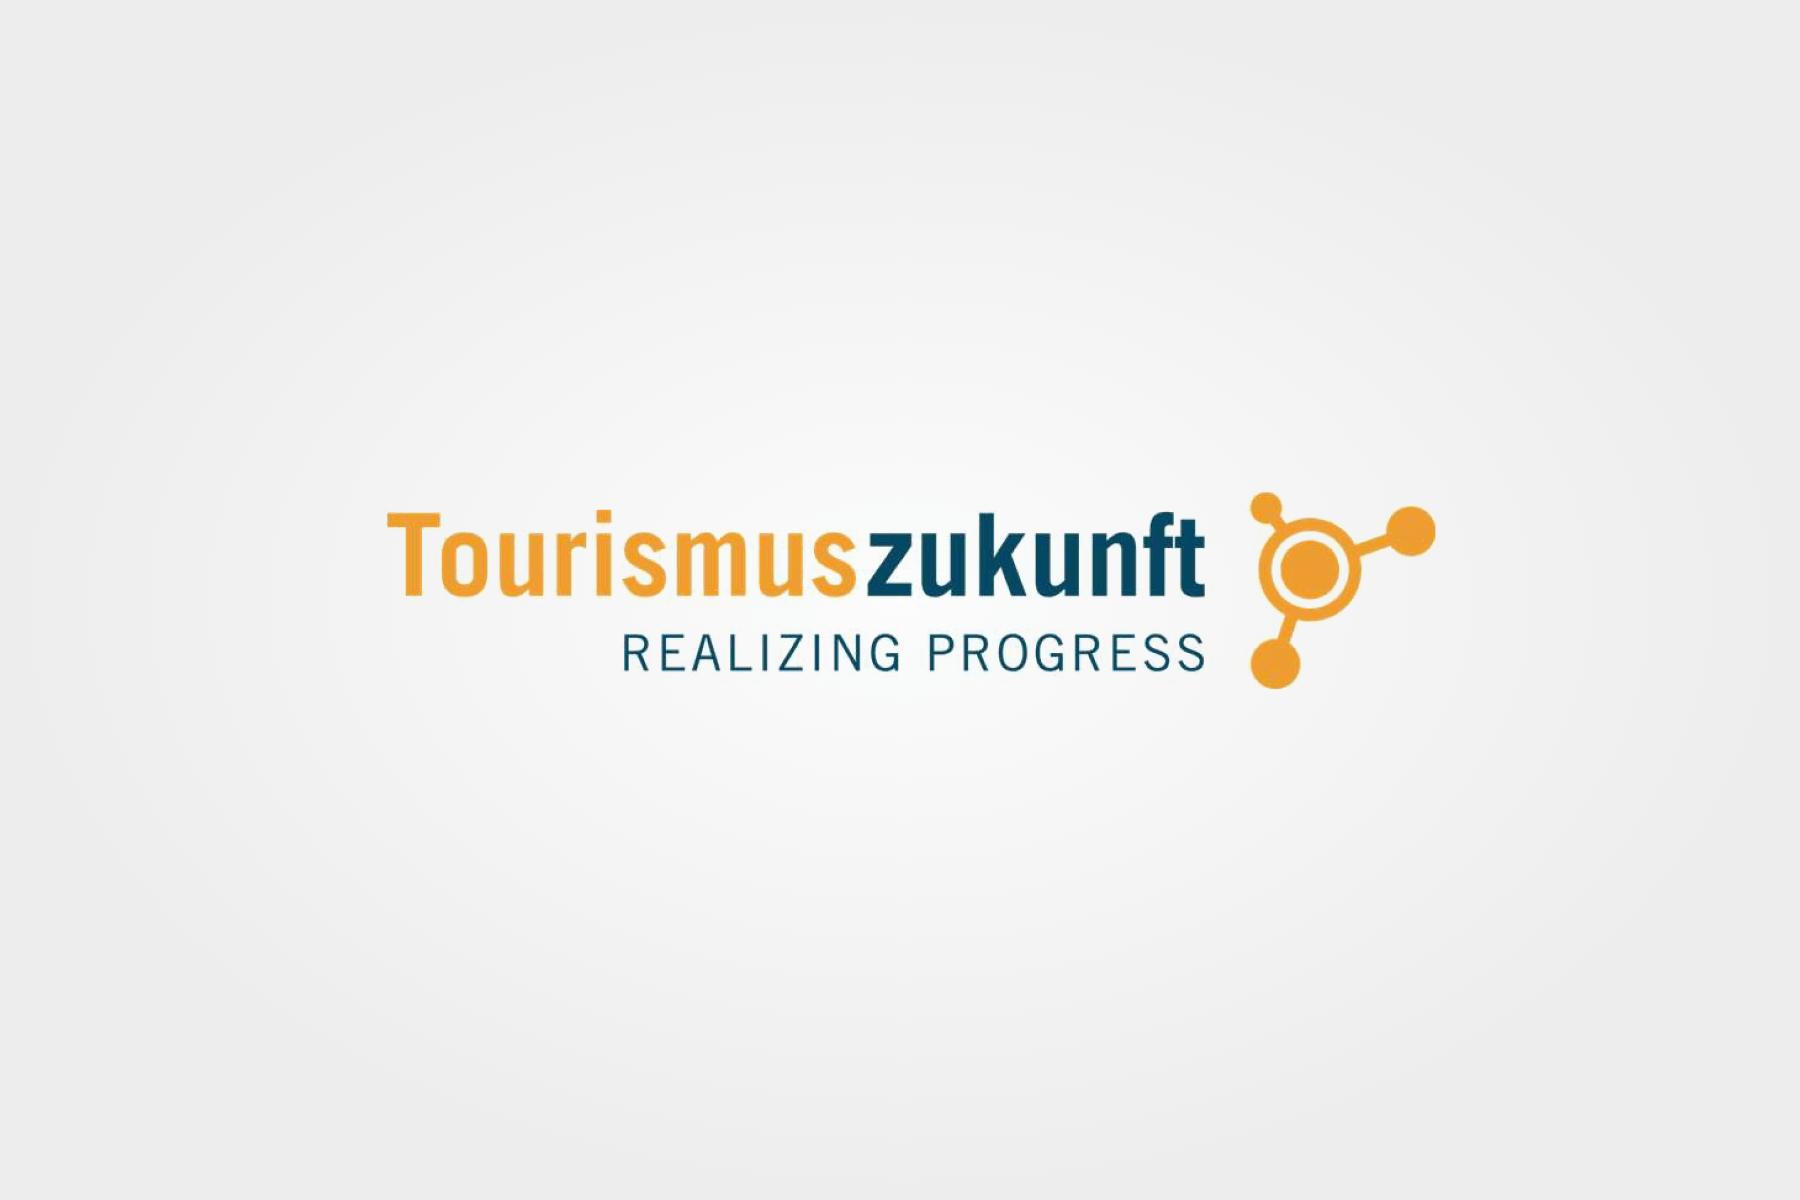 Tourismuszukunft – Realizing Progress